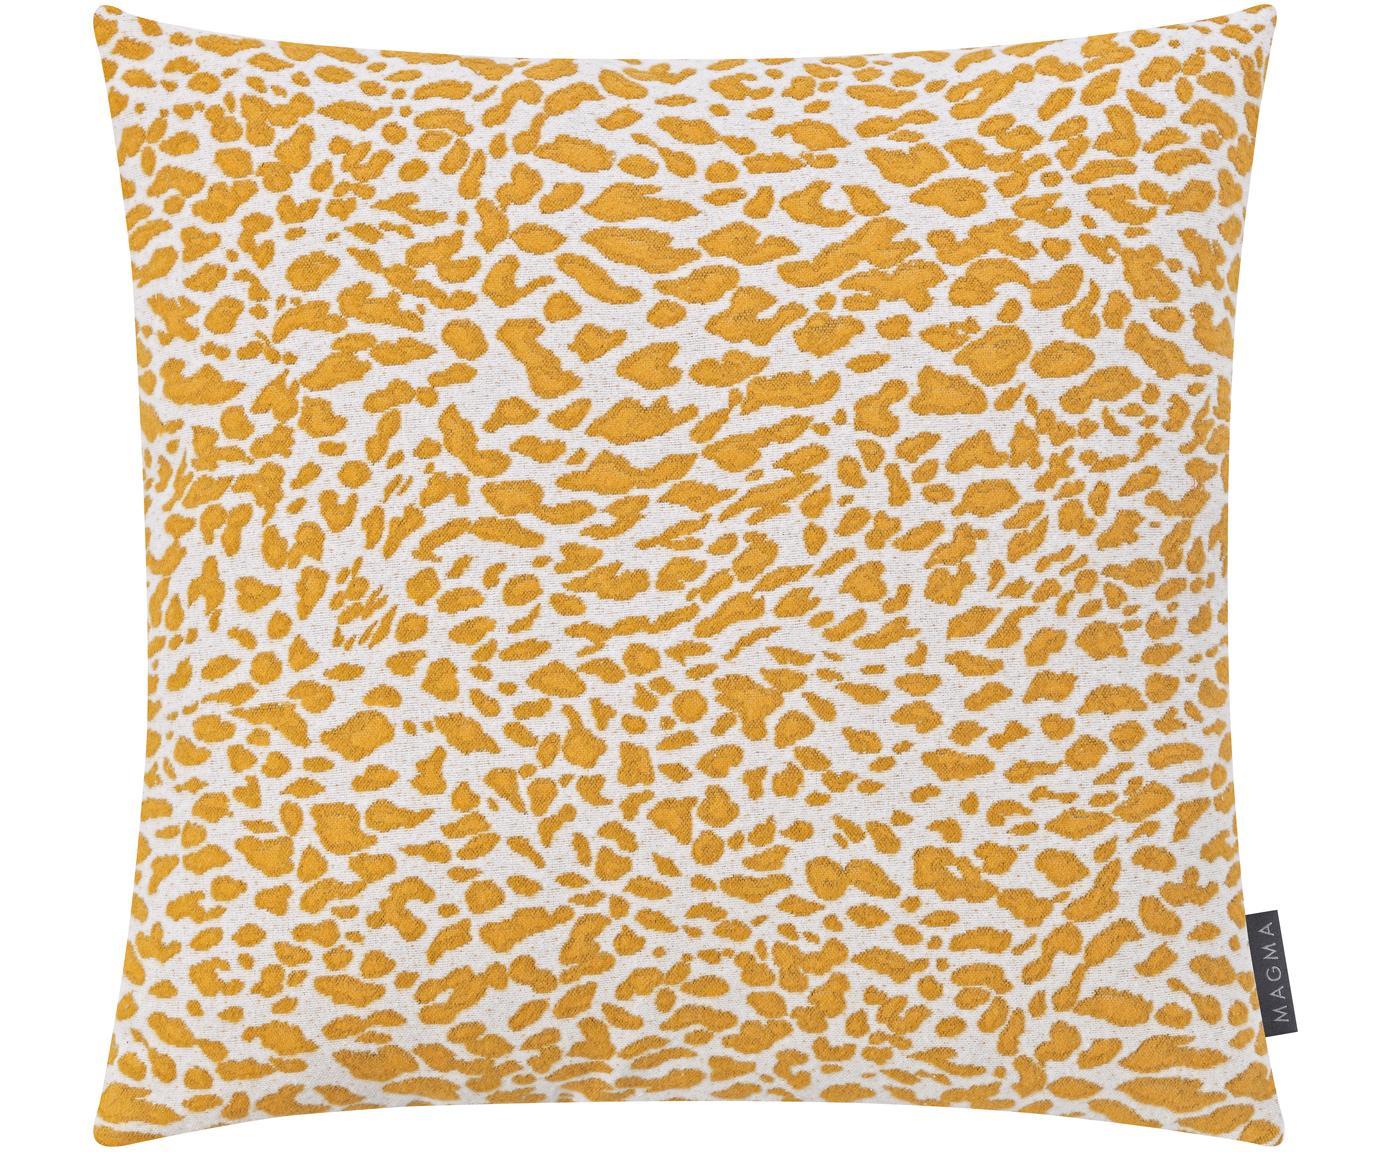 Funda de cojín Leopardo, Parte superior: 59%algodón, 41%poliéste, Mostaza, blanco, An 50 x L 50 cm